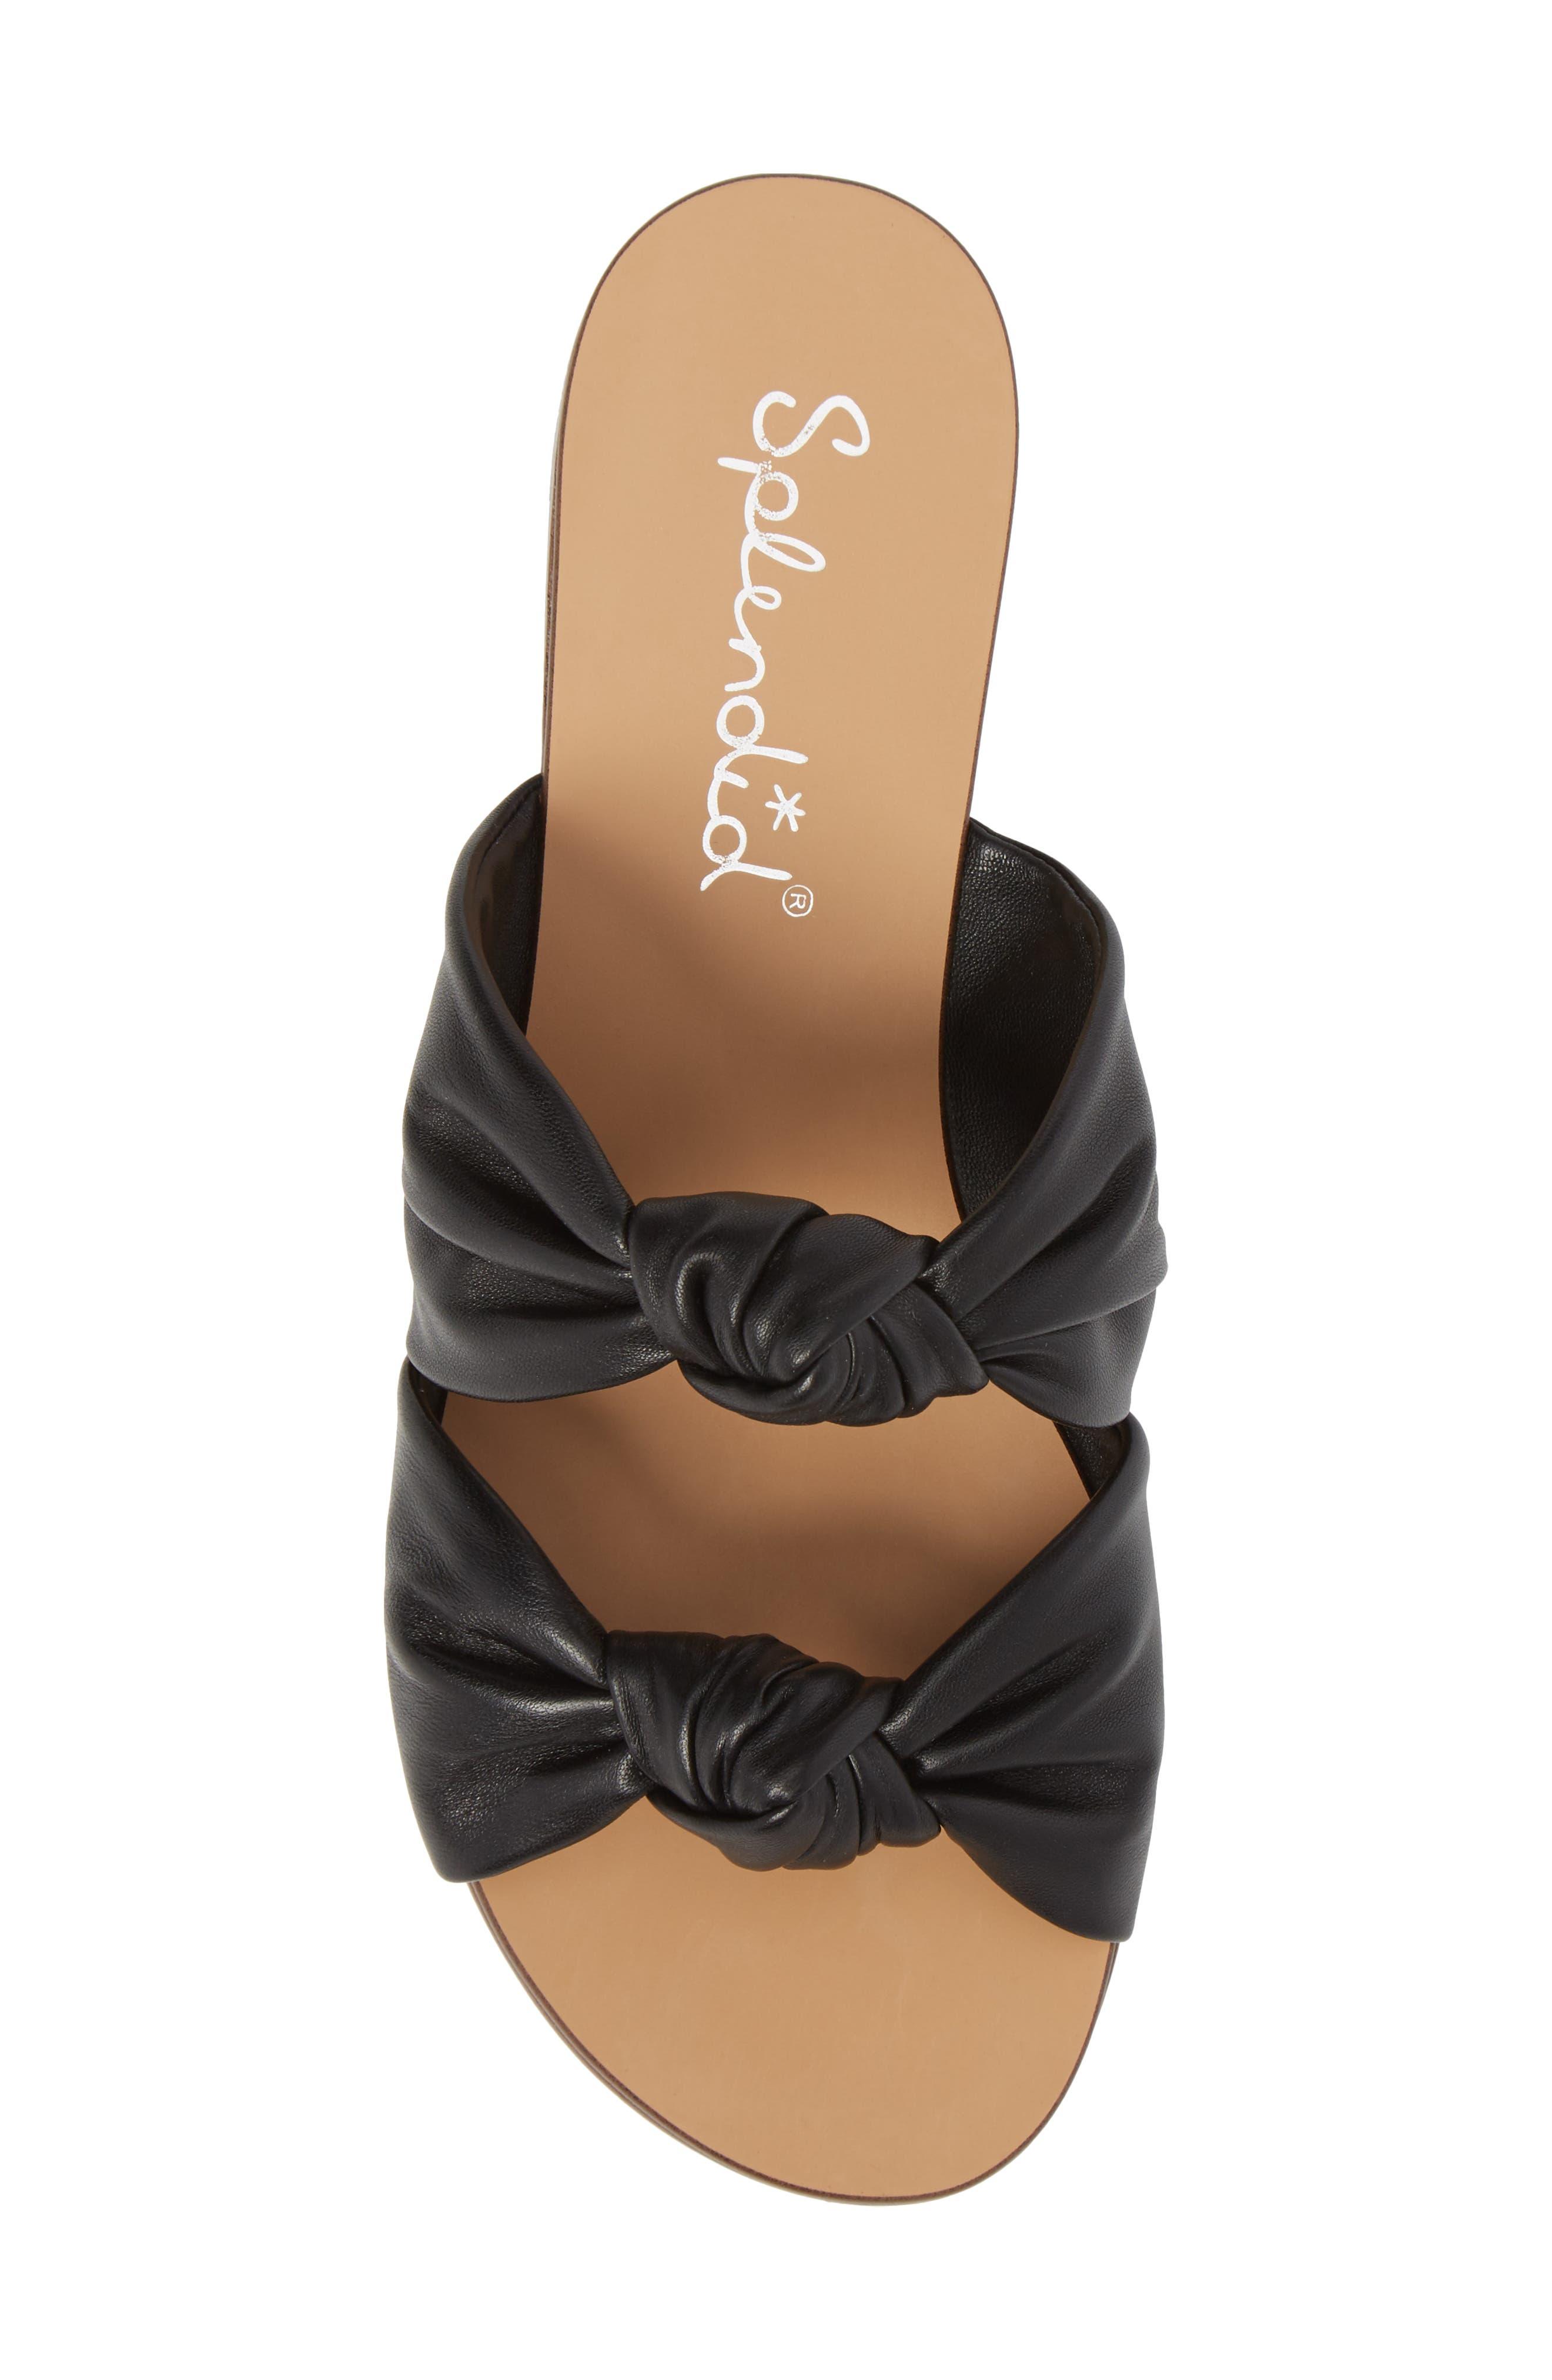 Barton Double Knotted Slide Sandal,                             Alternate thumbnail 5, color,                             BLACK LEATHER